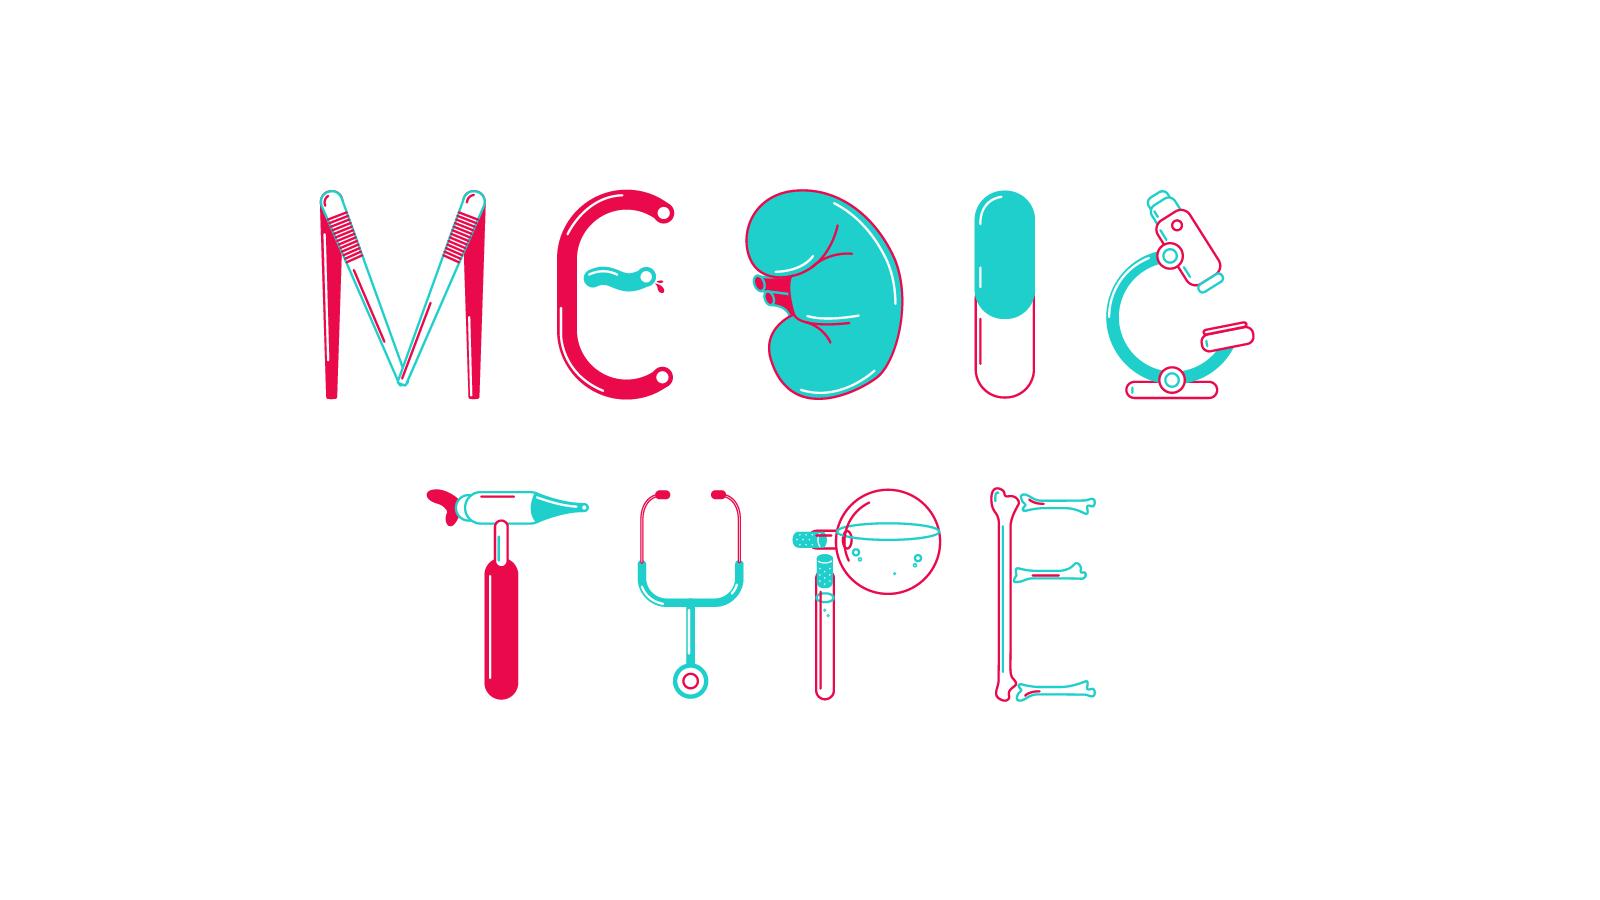 medic01